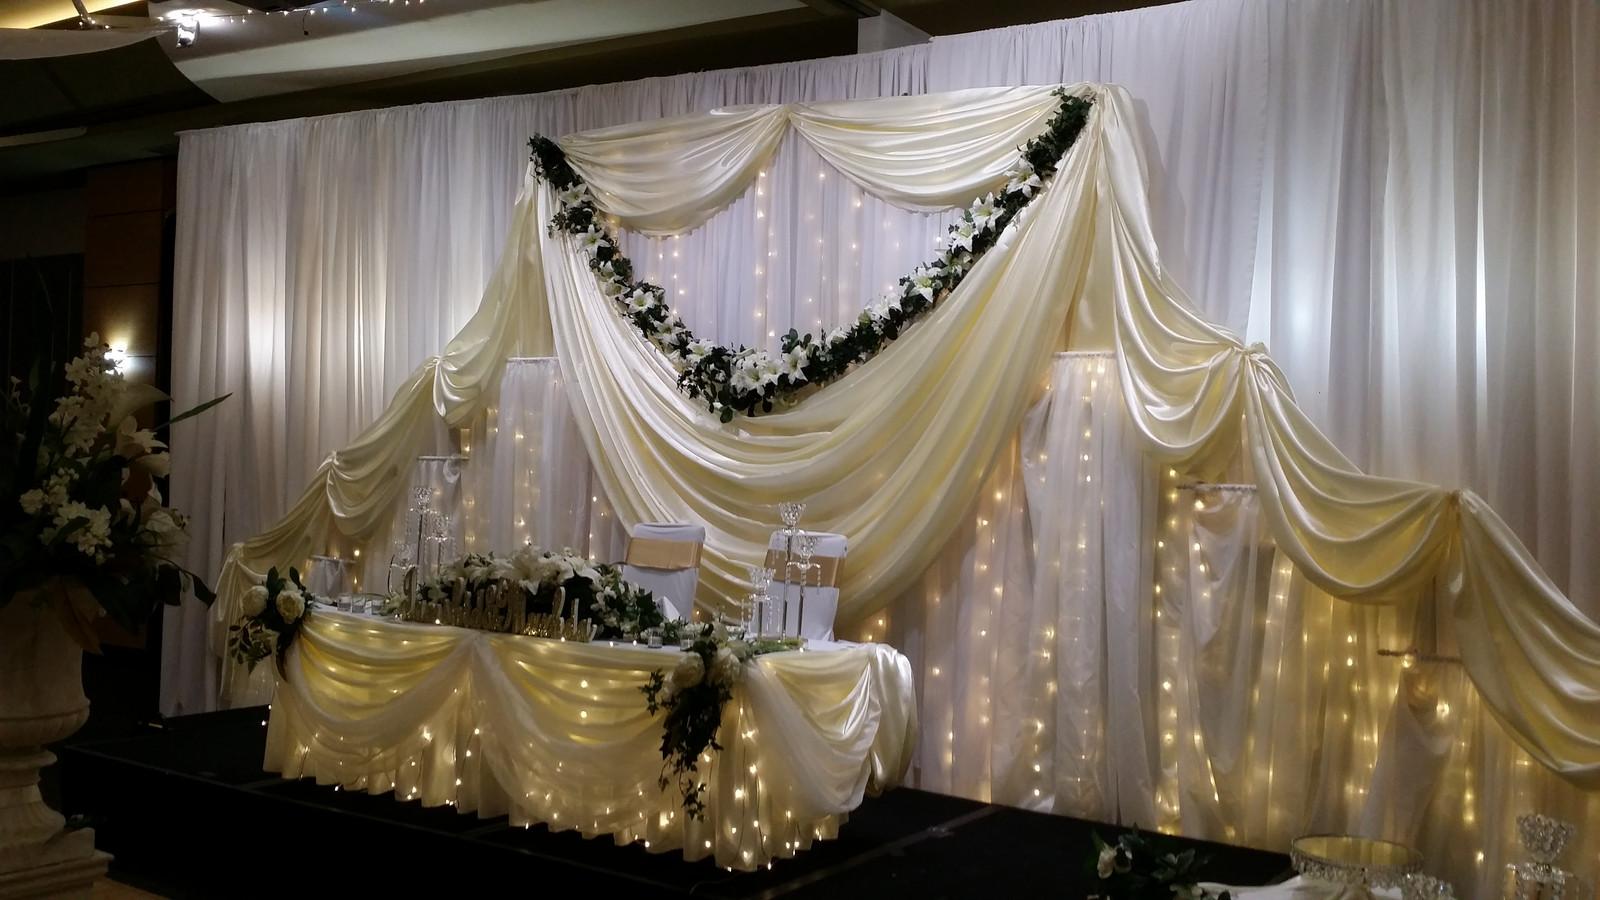 Canberra Wedding Decorator Canberra Wedding Hire